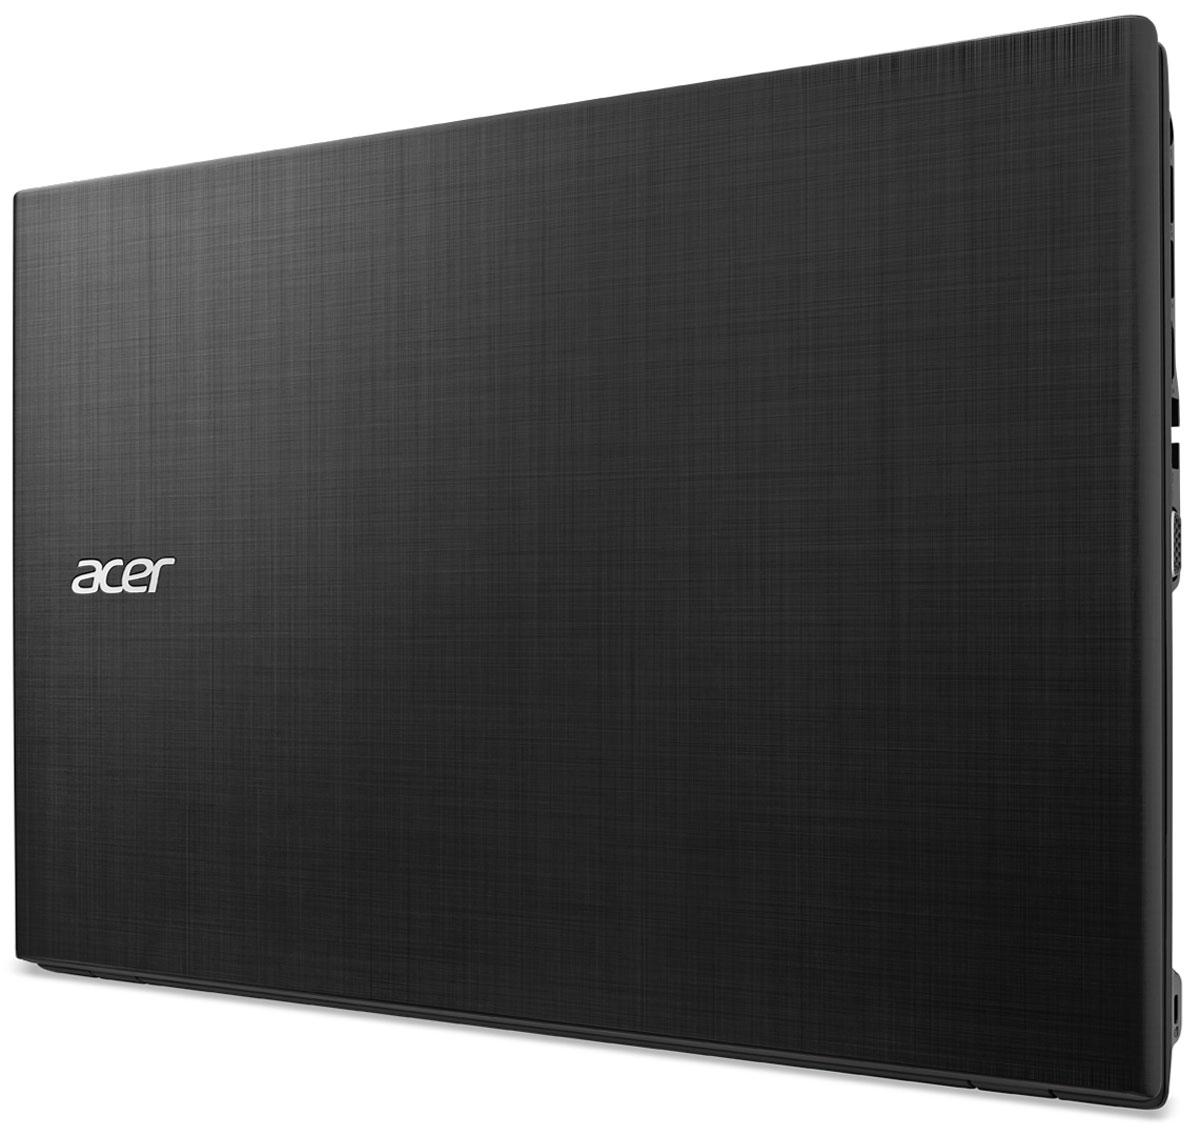 Acer Aspire F5-571G-59XP, Black (YBNX.GA2ER.004)